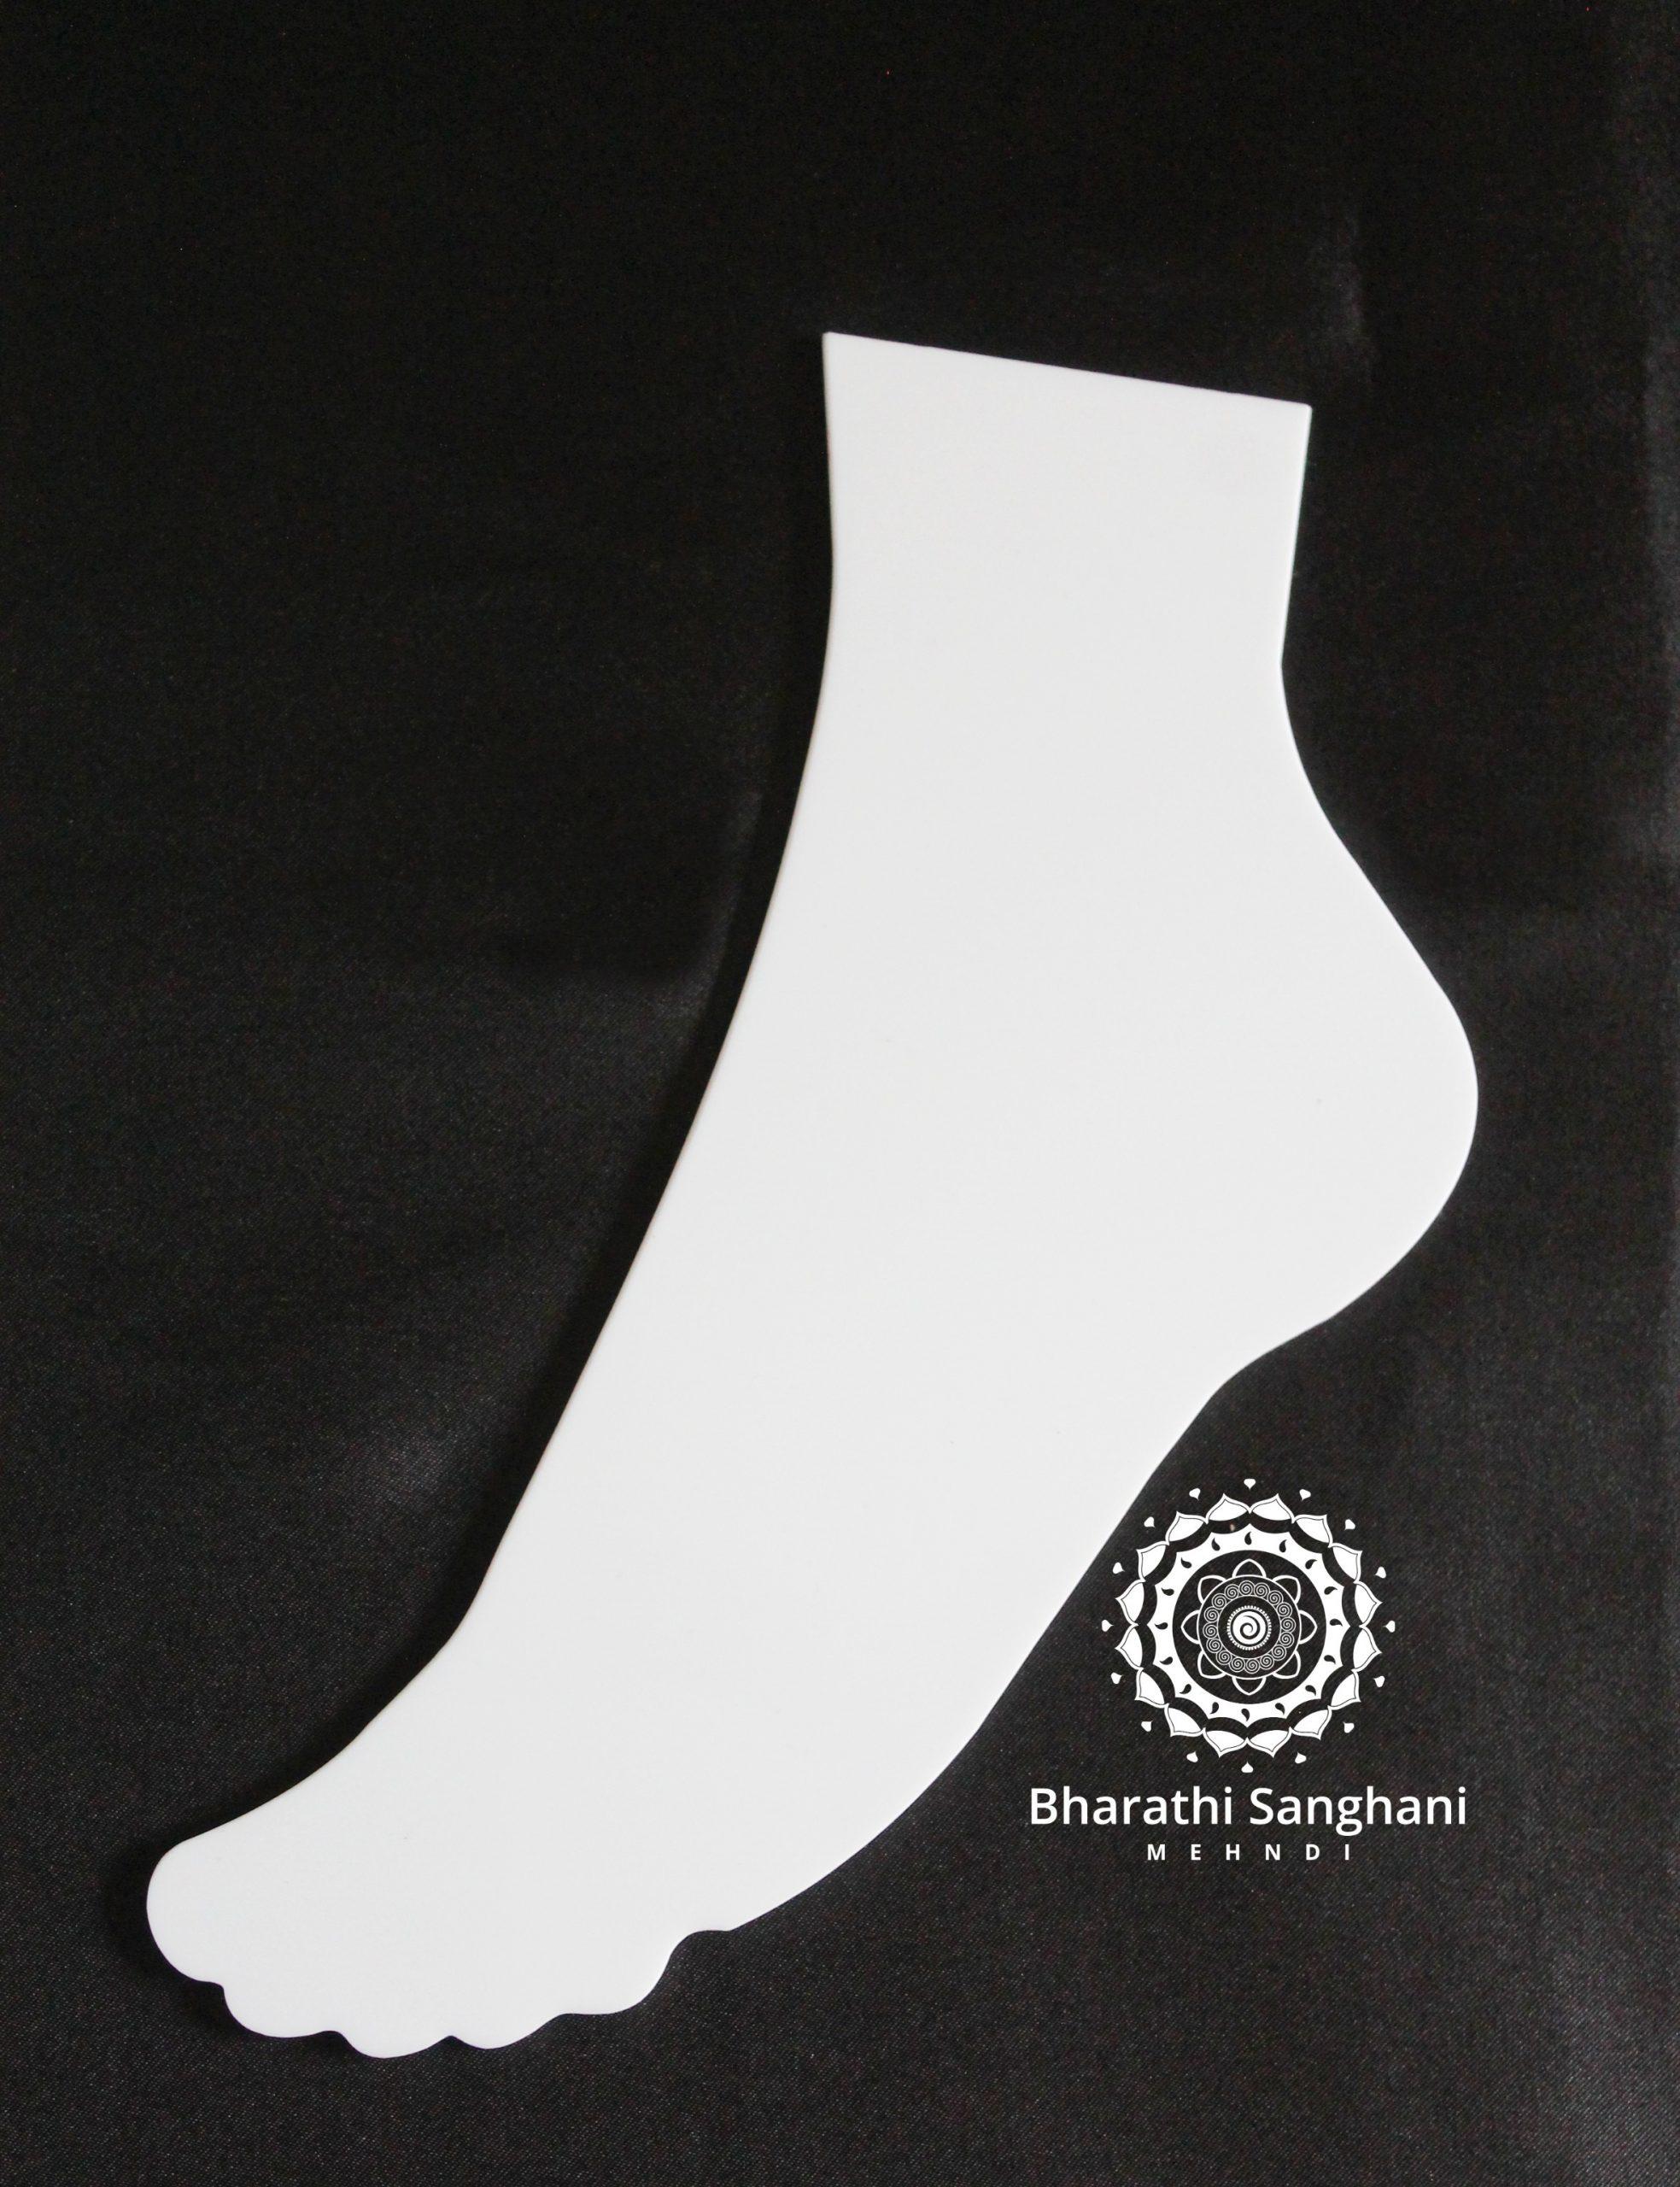 acrylic side foot